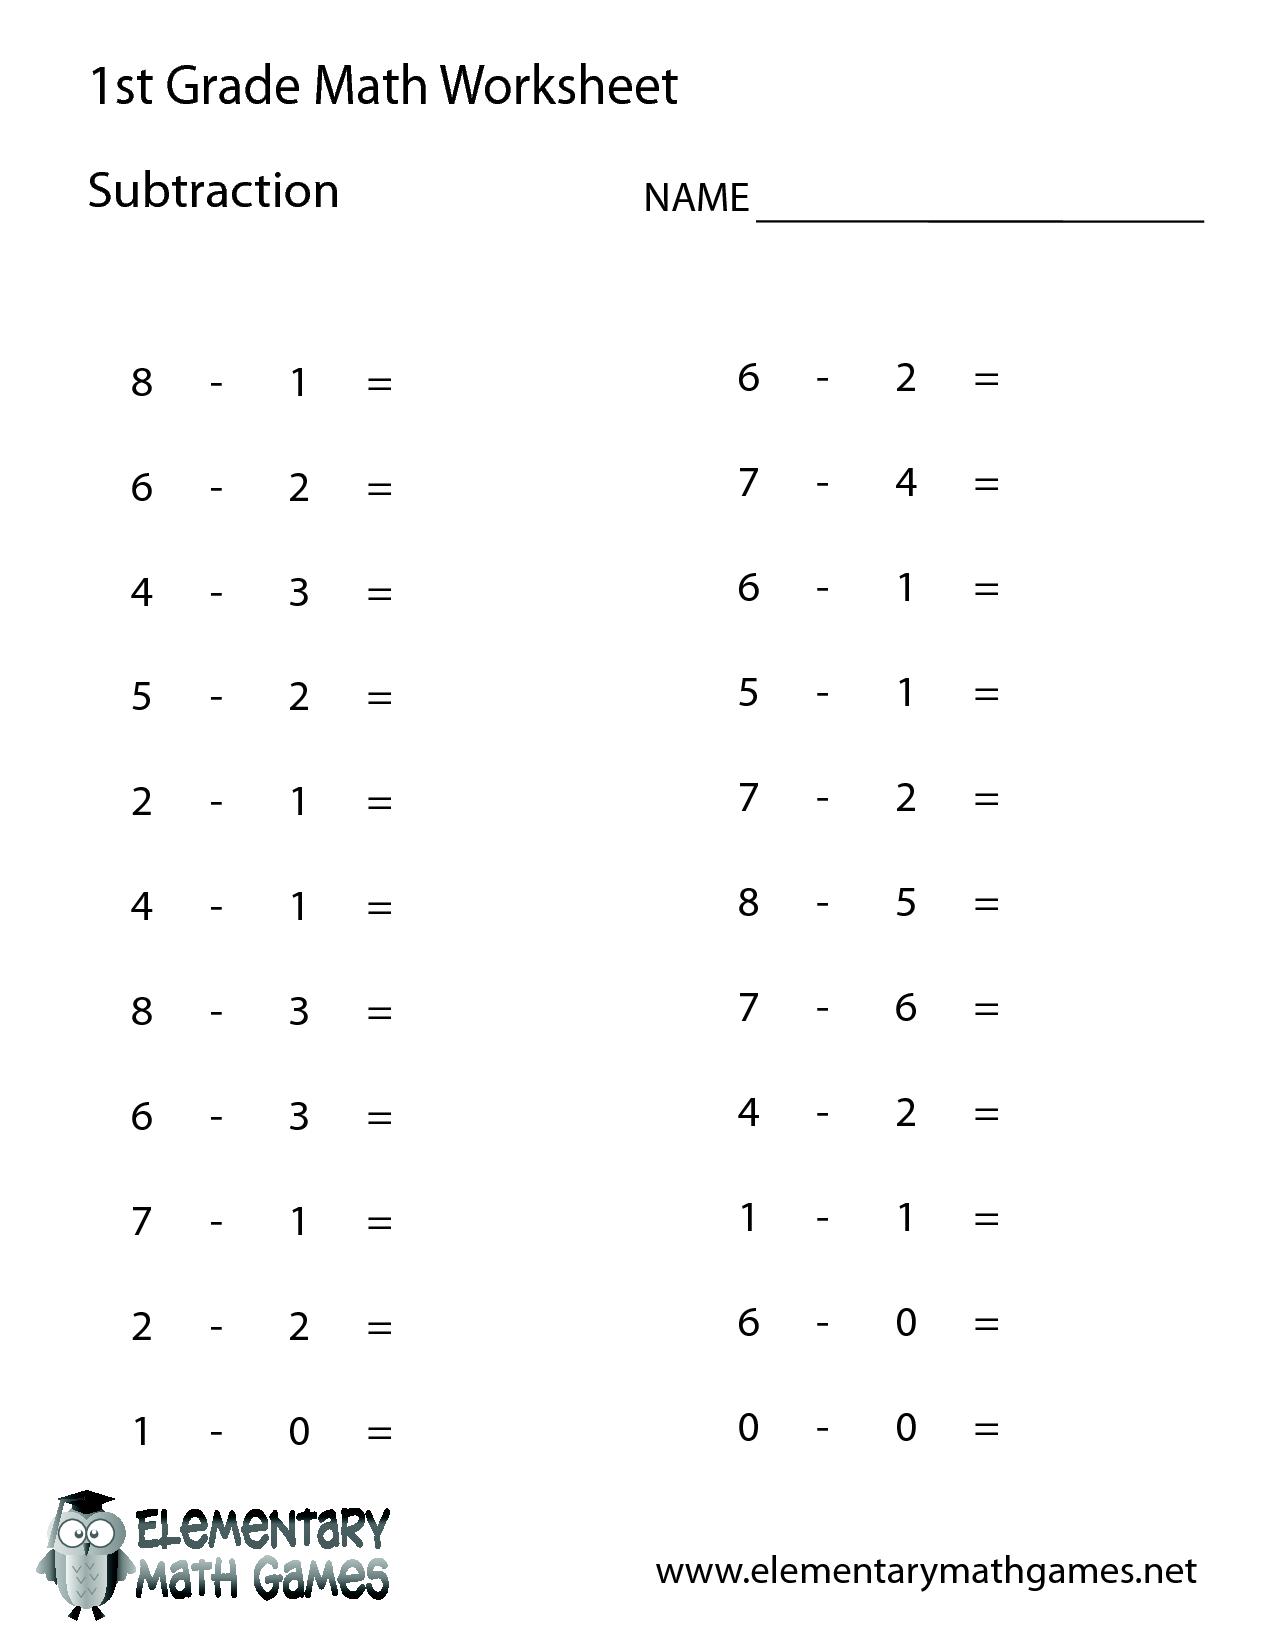 1St Grade Math Worksheets | 1St Grade Math | 1St Grade Math | Free Printable Addition Worksheets For First Grade